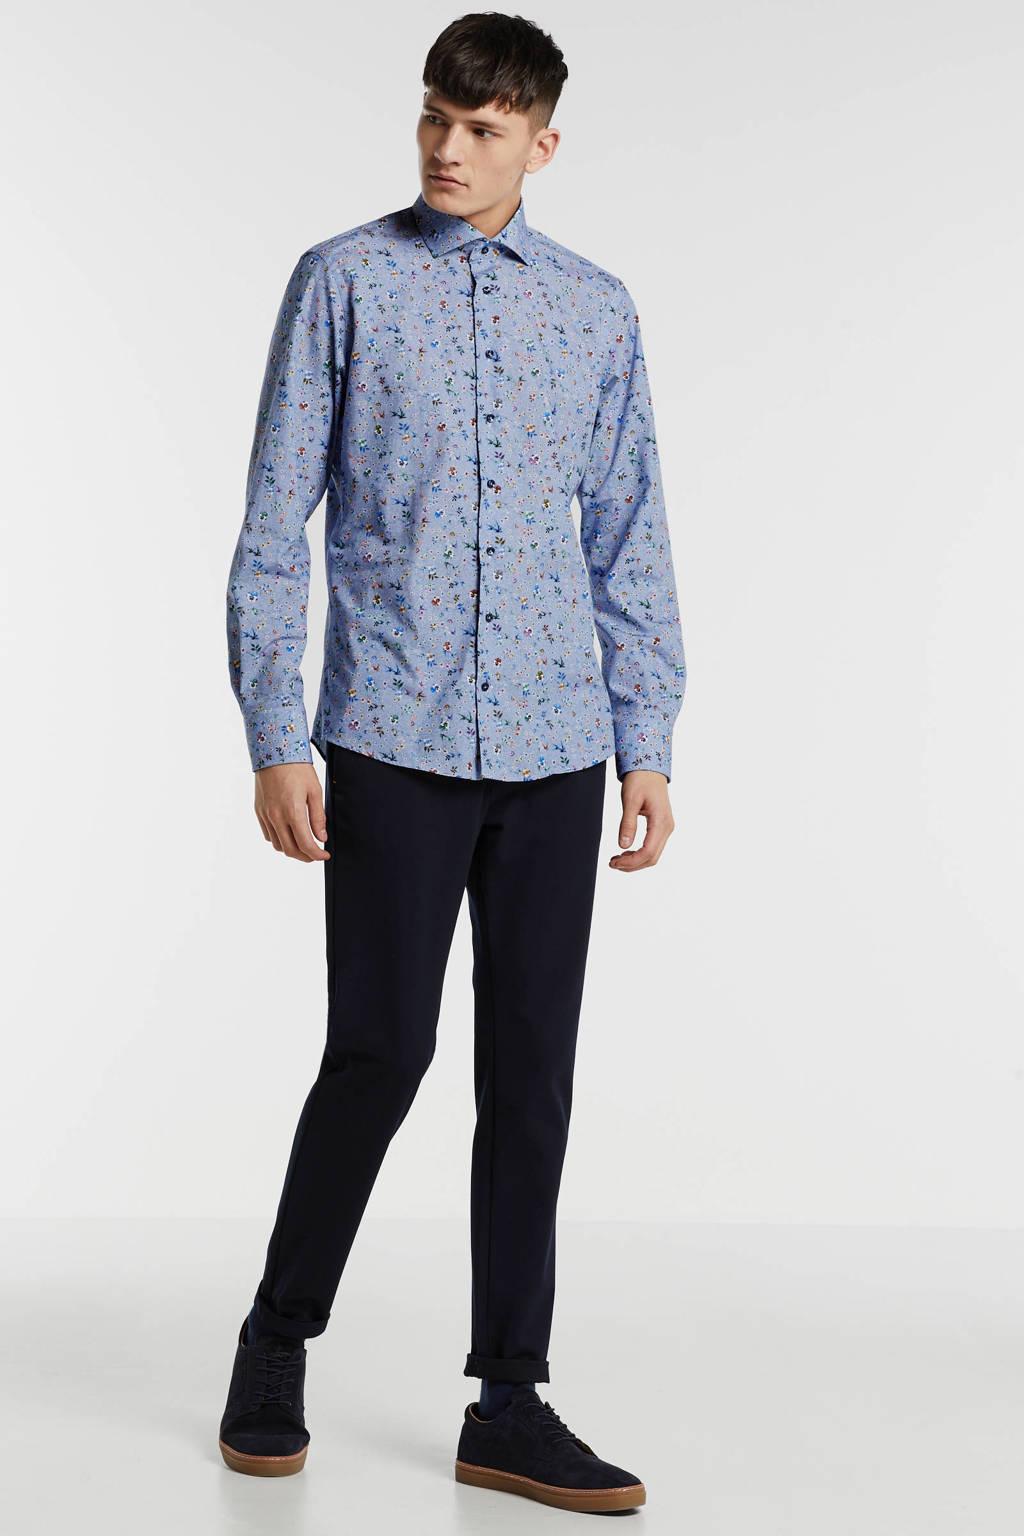 Profuomo gebloemd slim fit overhemd blauw/groen/roze/paars/geel, Blauw/groen/roze/paars/geel